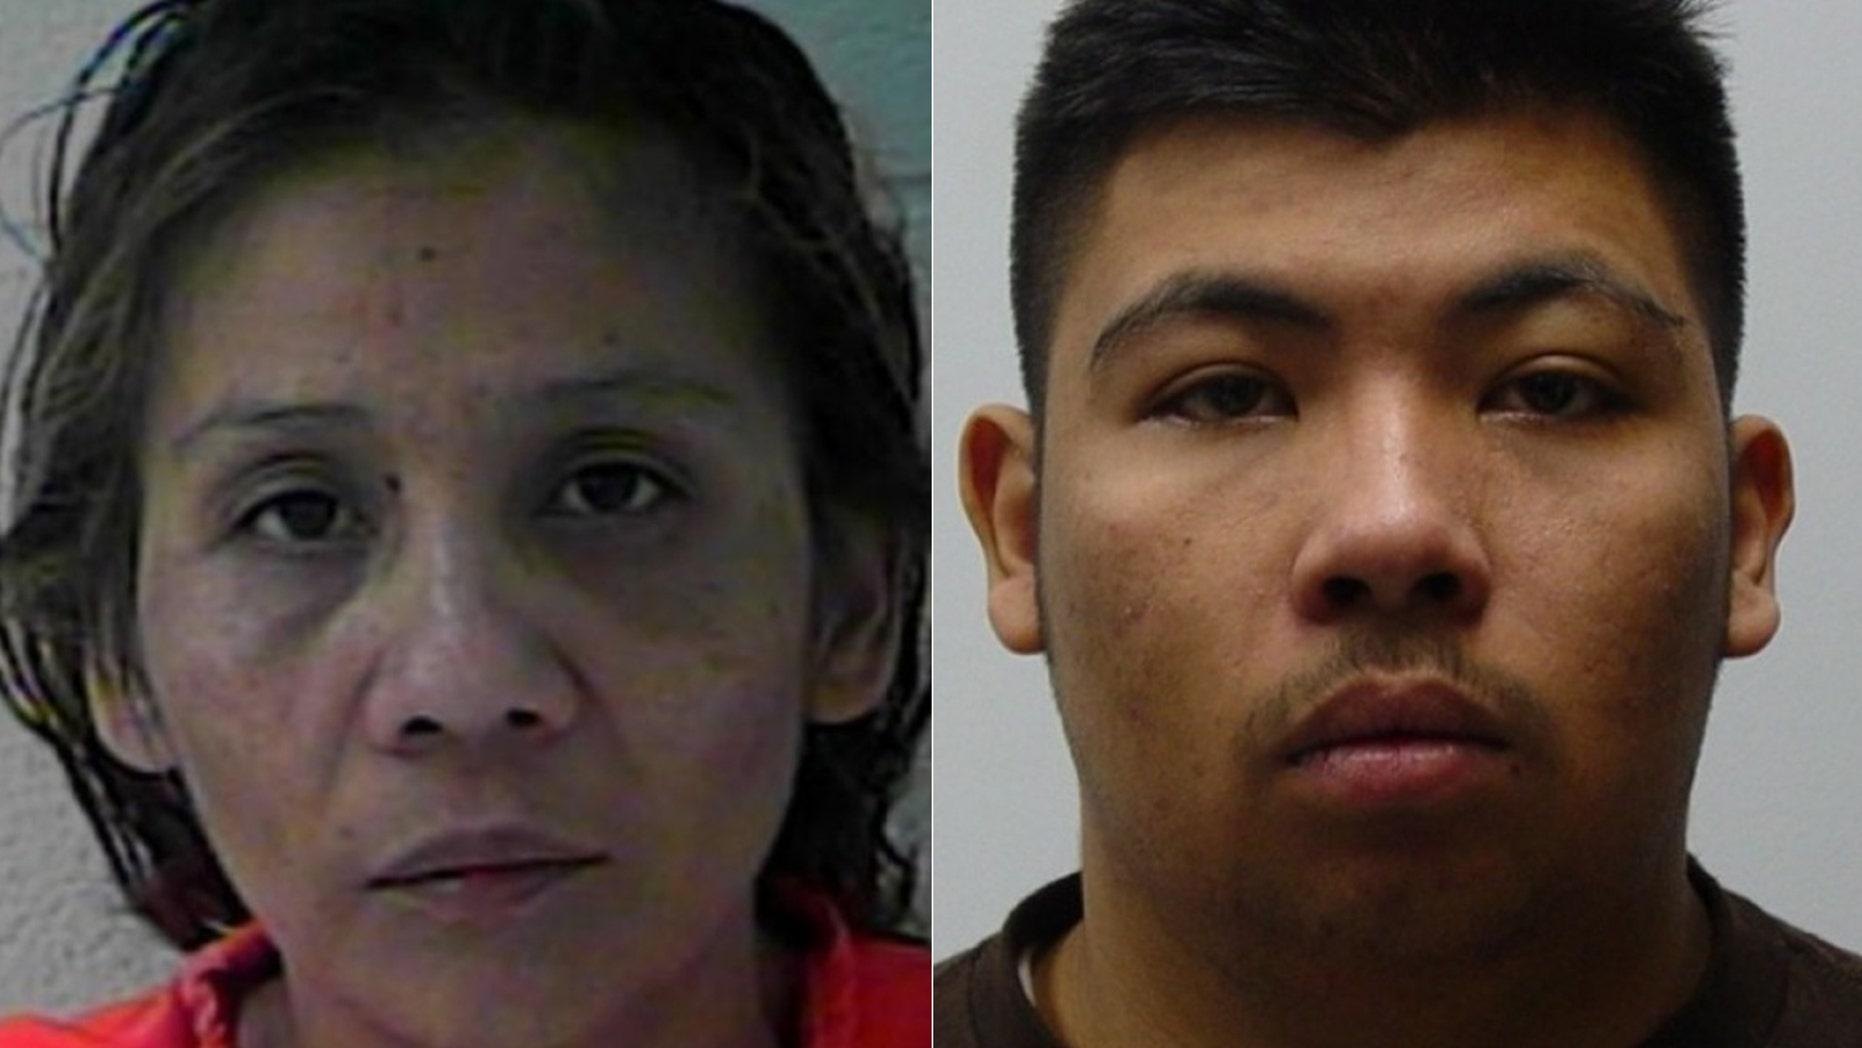 Celia Ruiz-Ocho ran a drug operation and passed the business to her son Sergio Ruiz.